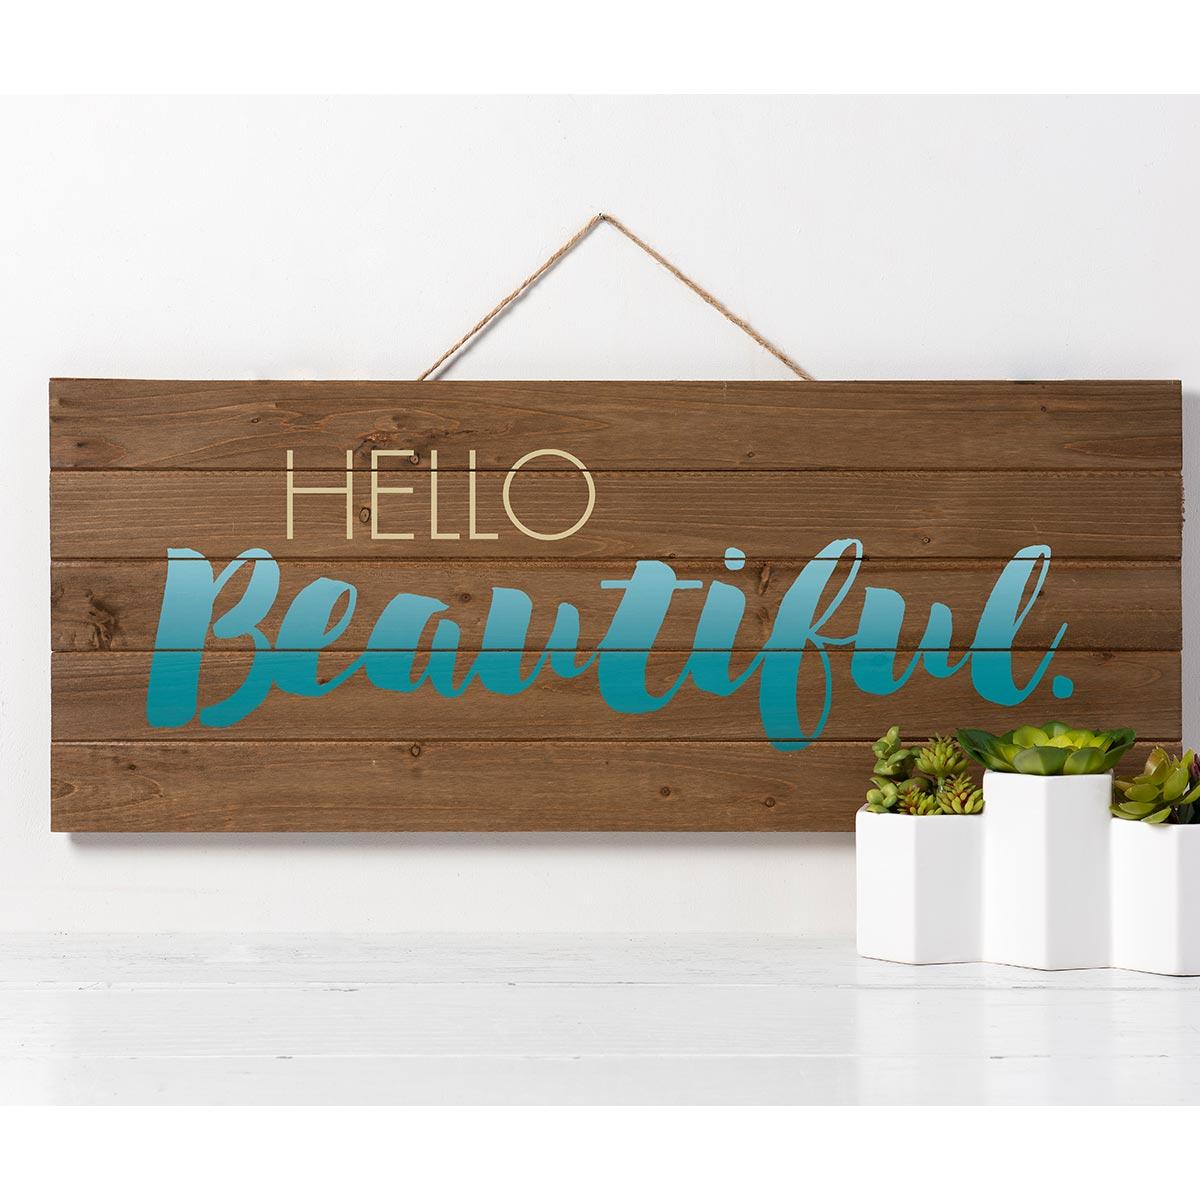 FolkArt ® Sign Shop™ Mesh Stencil - Hello Beautiful - 63386